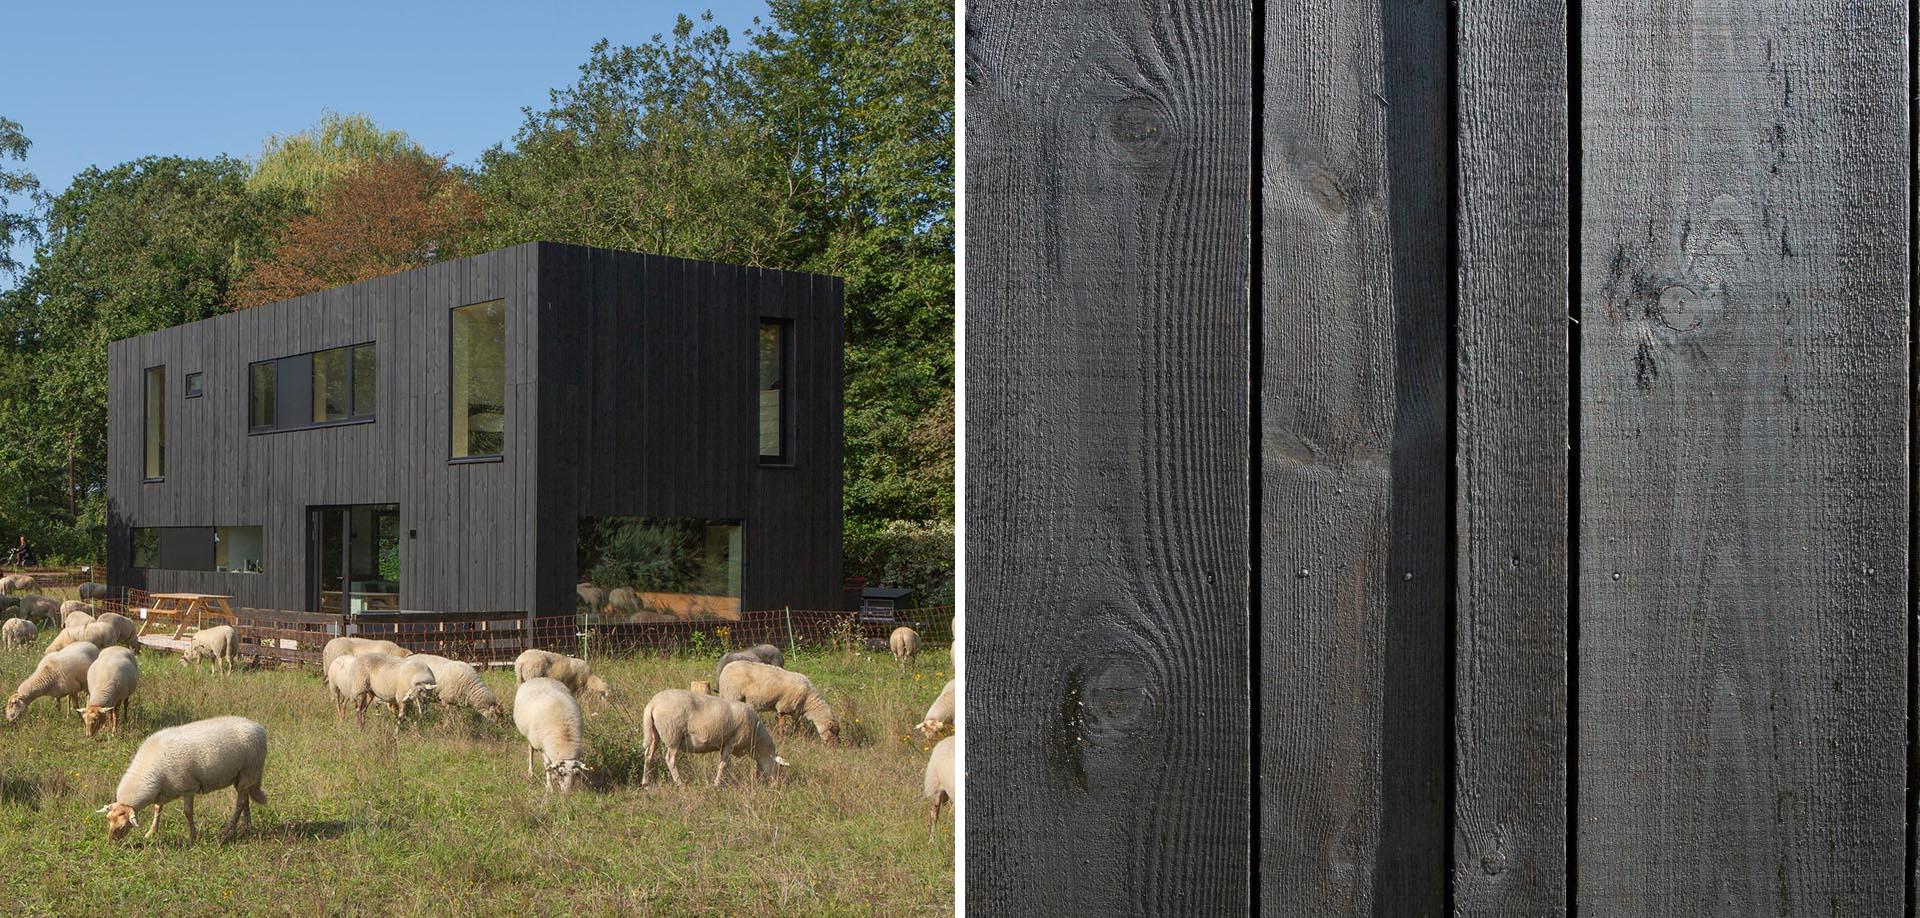 A modern prefab home with black wood siding and black window frames.